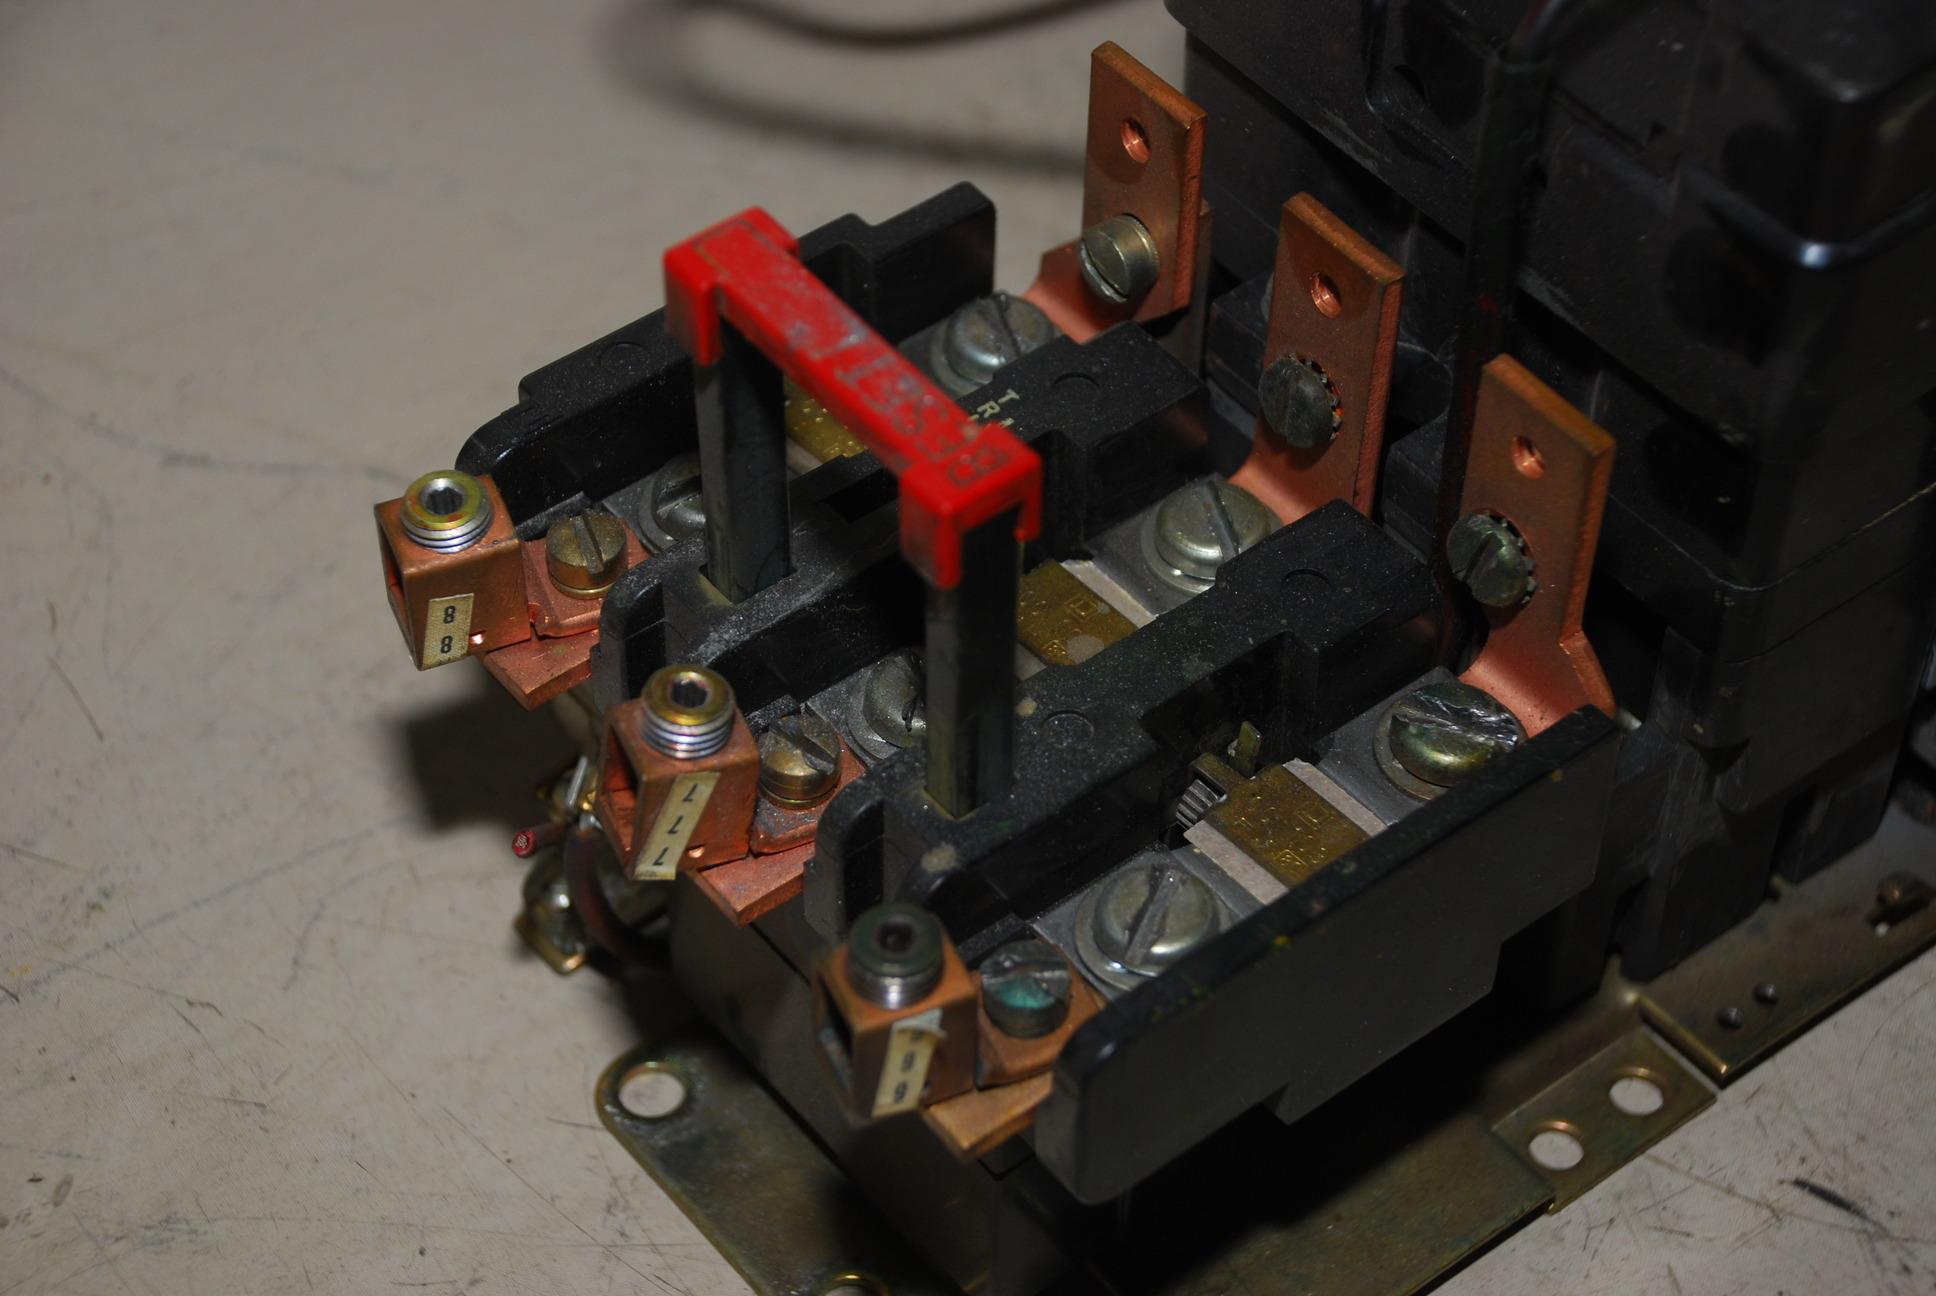 Square d nema size 3 seo 1 8536 motor starter 600v form s for Nema size 1 motor starter